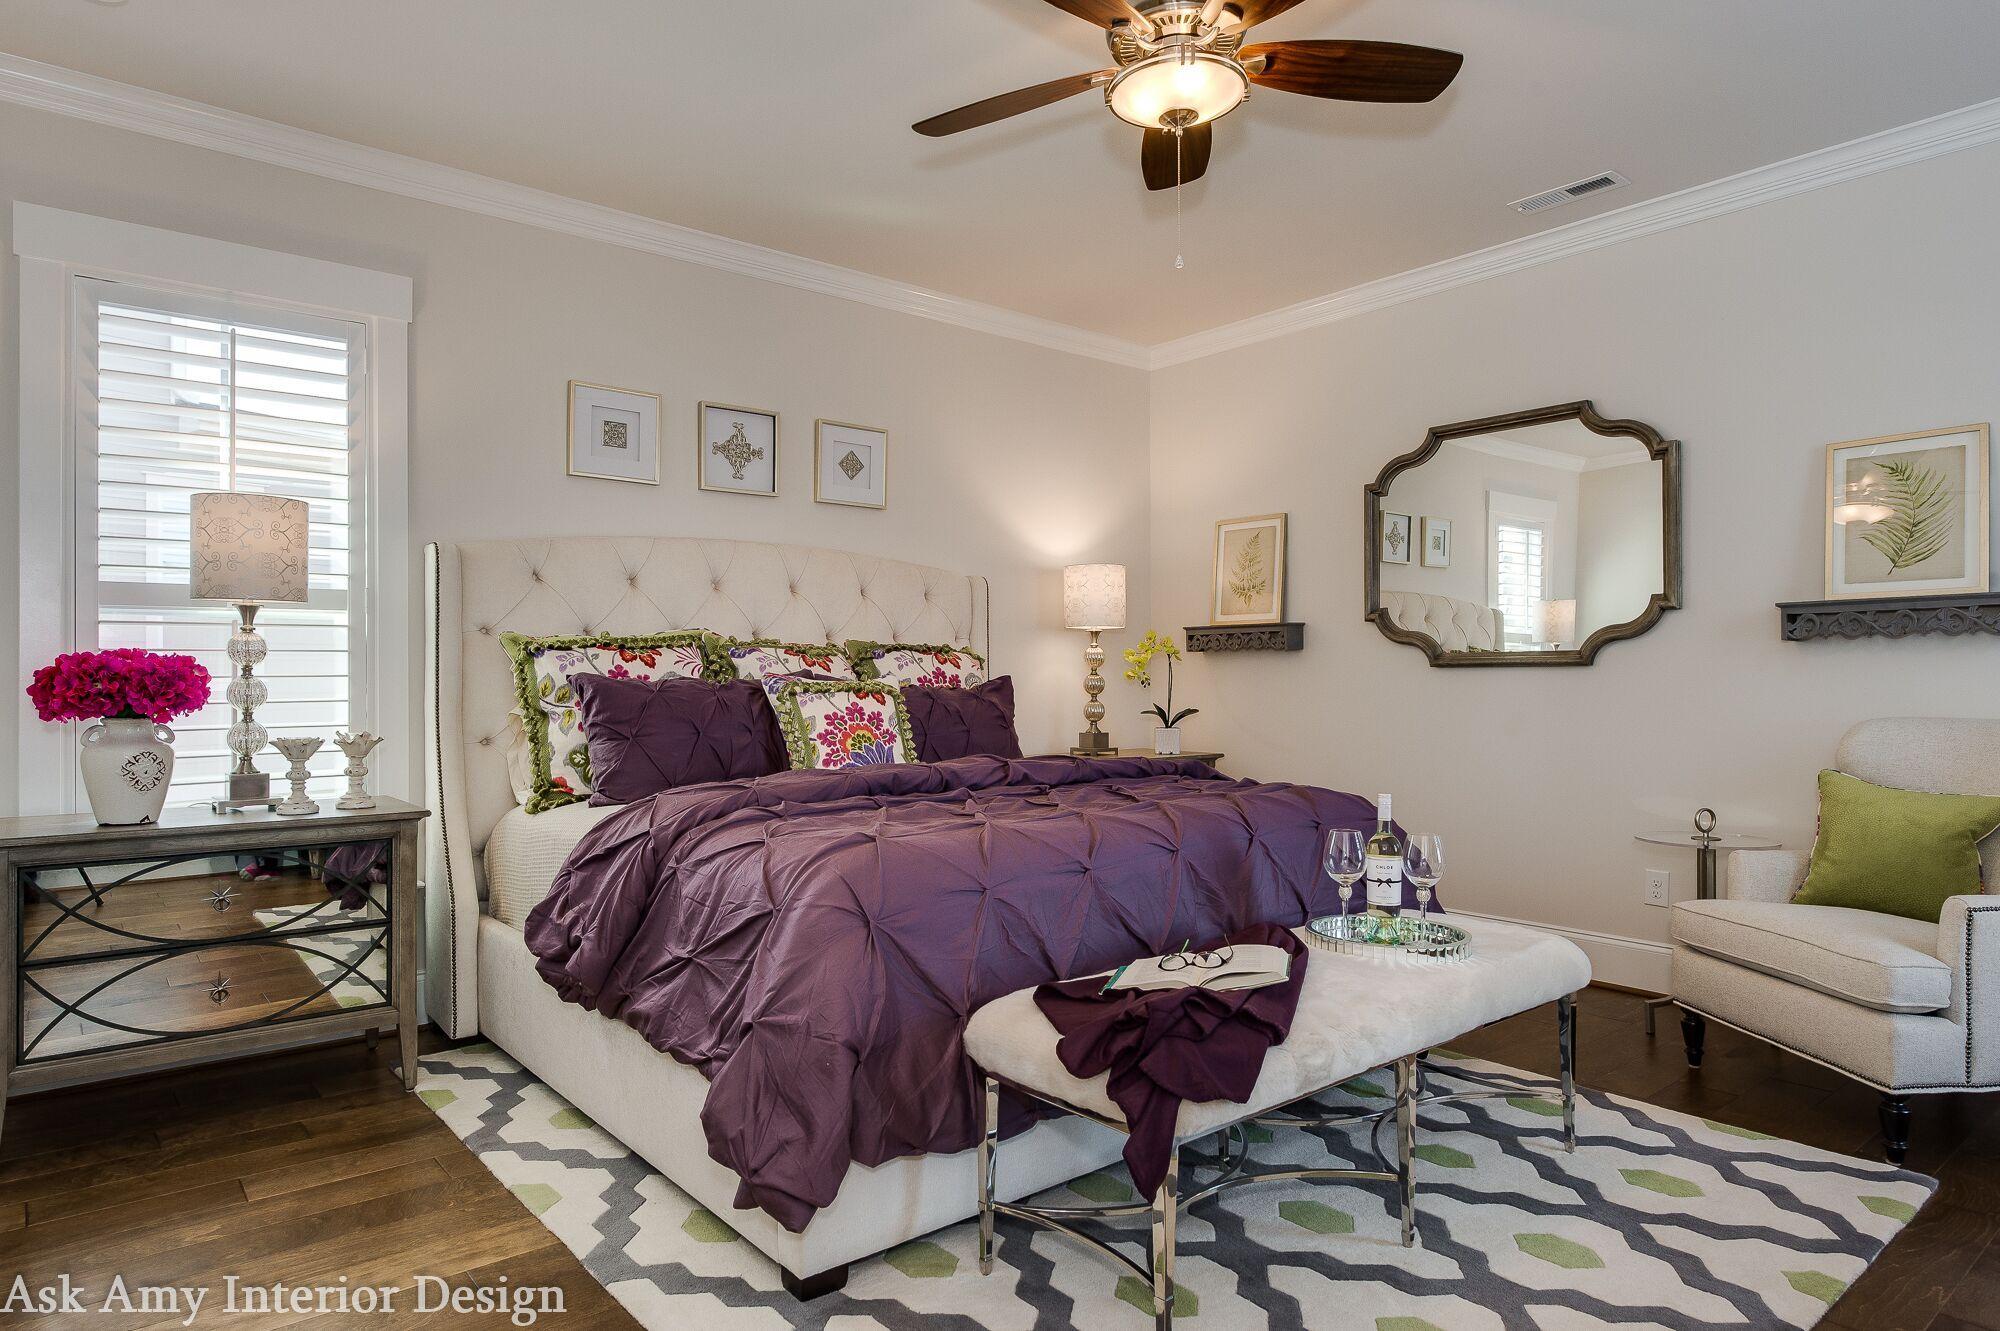 home charlotte commercial design and design firms rh pinterest com Family Room Interior Design Interior Design Companies Charlotte NC